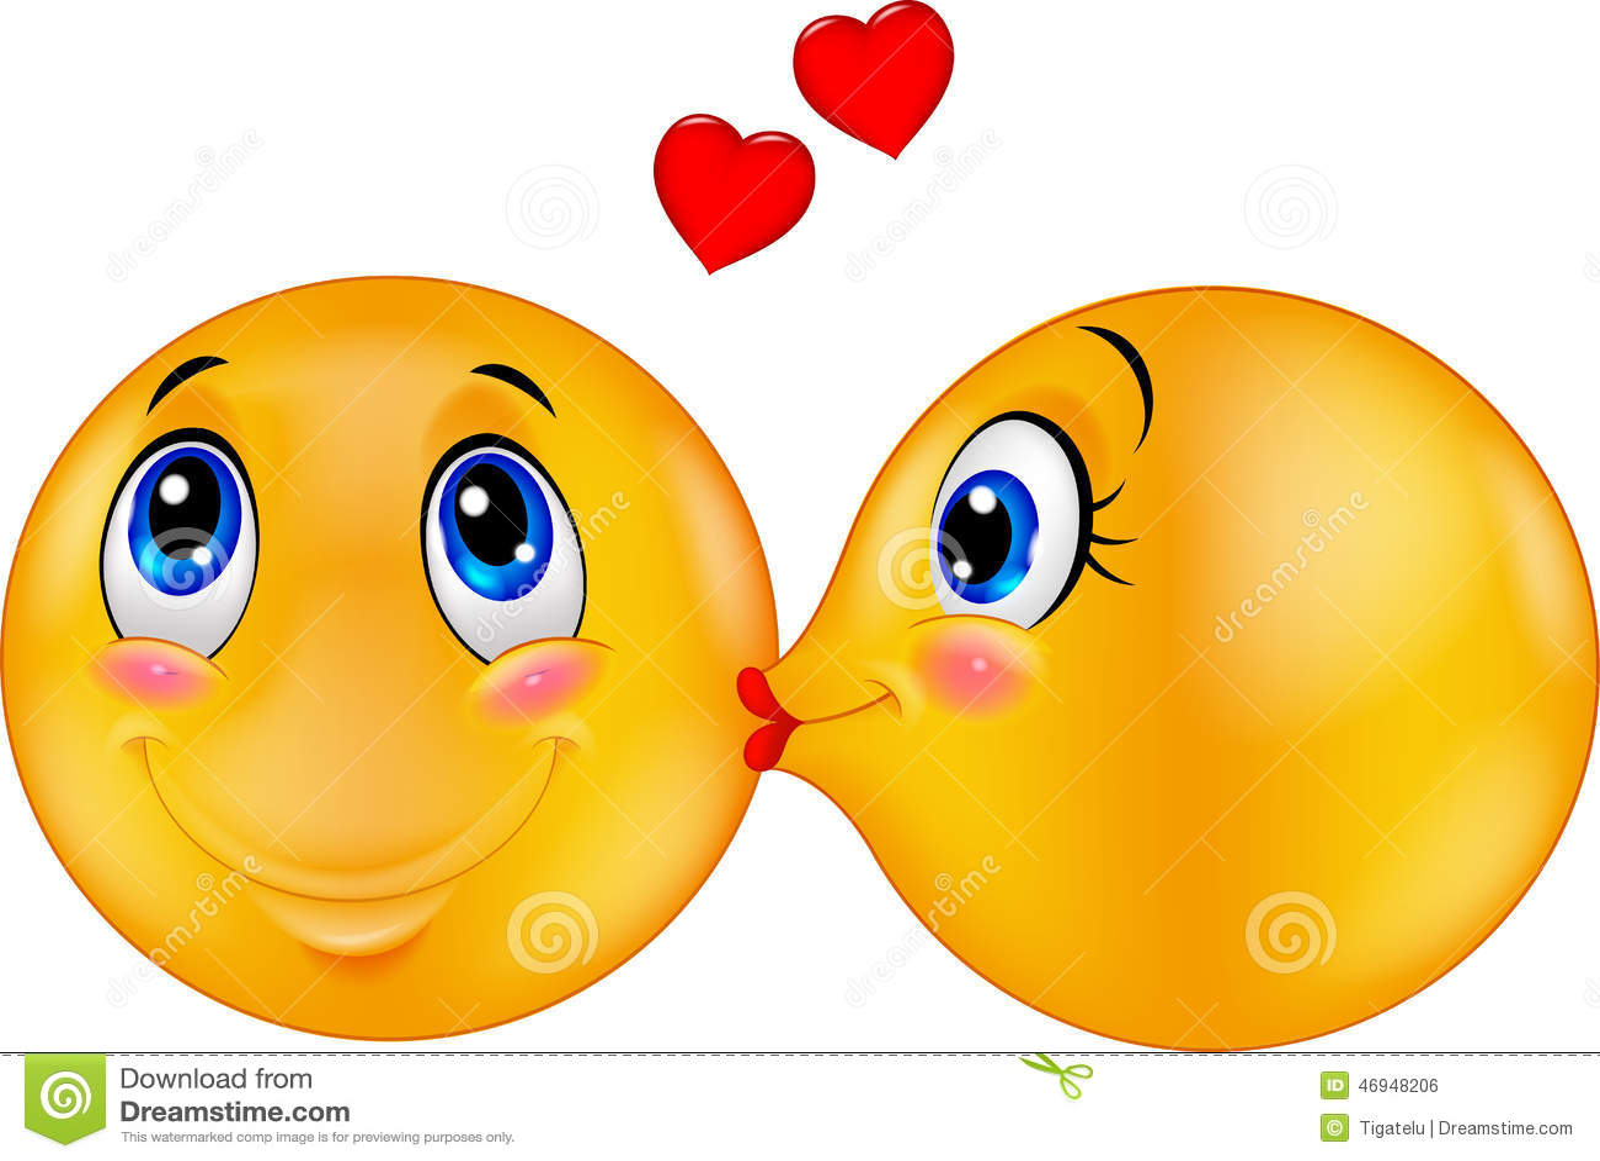 Animated Kissing Emoticons Crazywidowfo